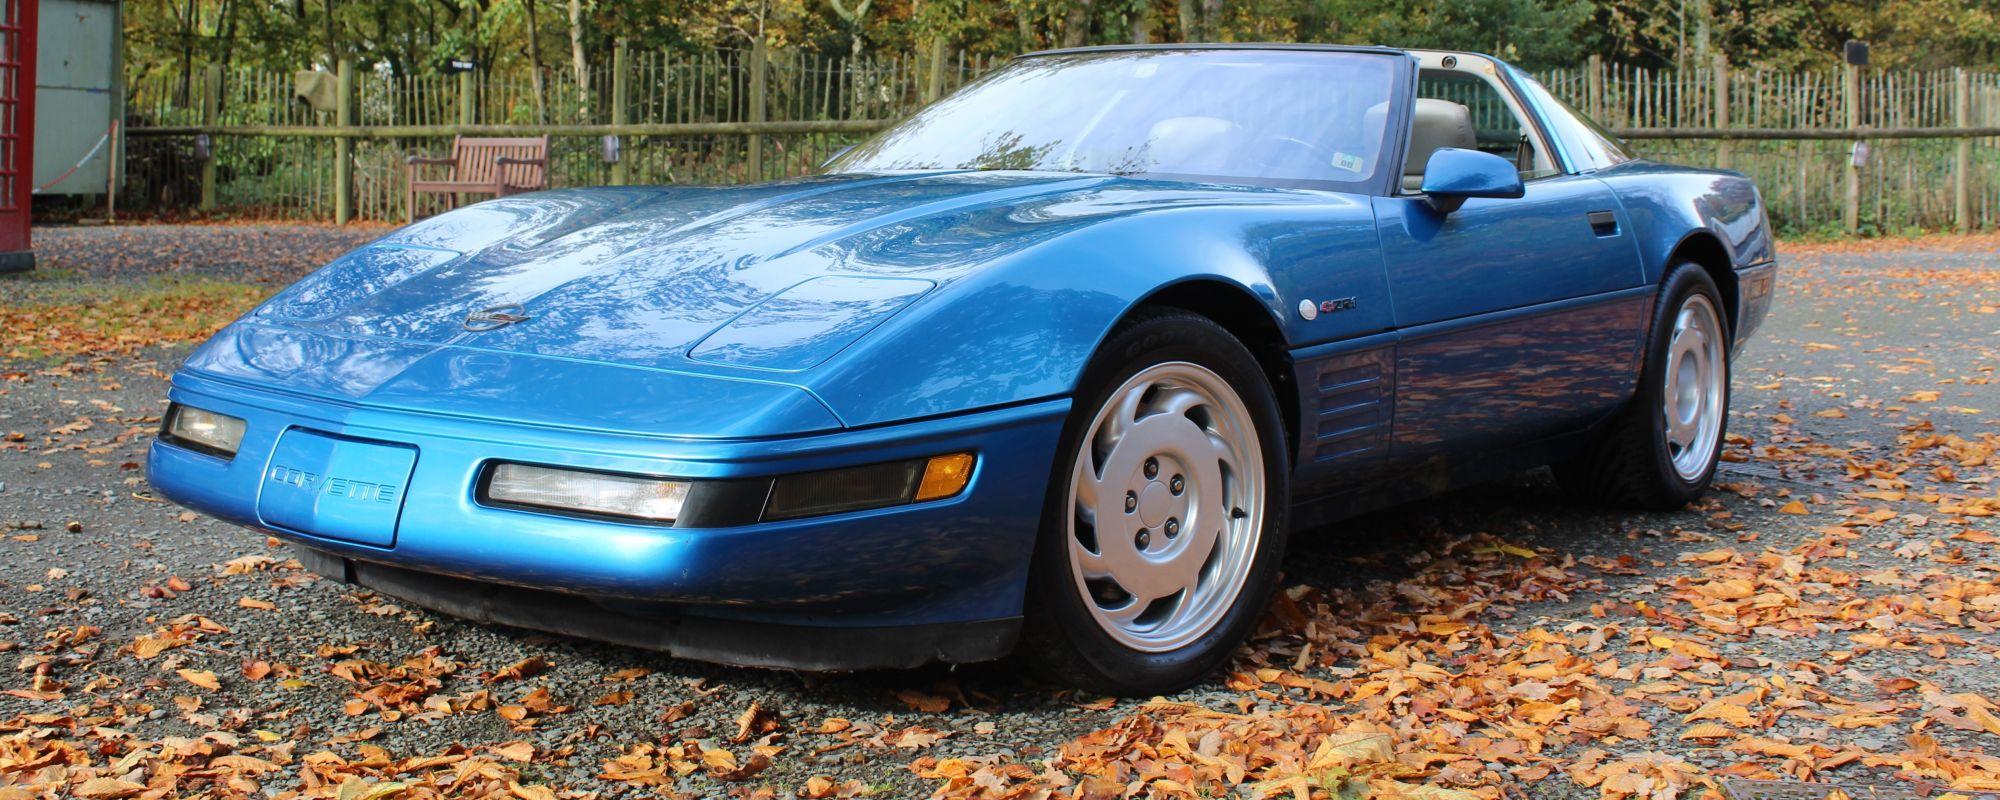 Corvette arrives at the museum